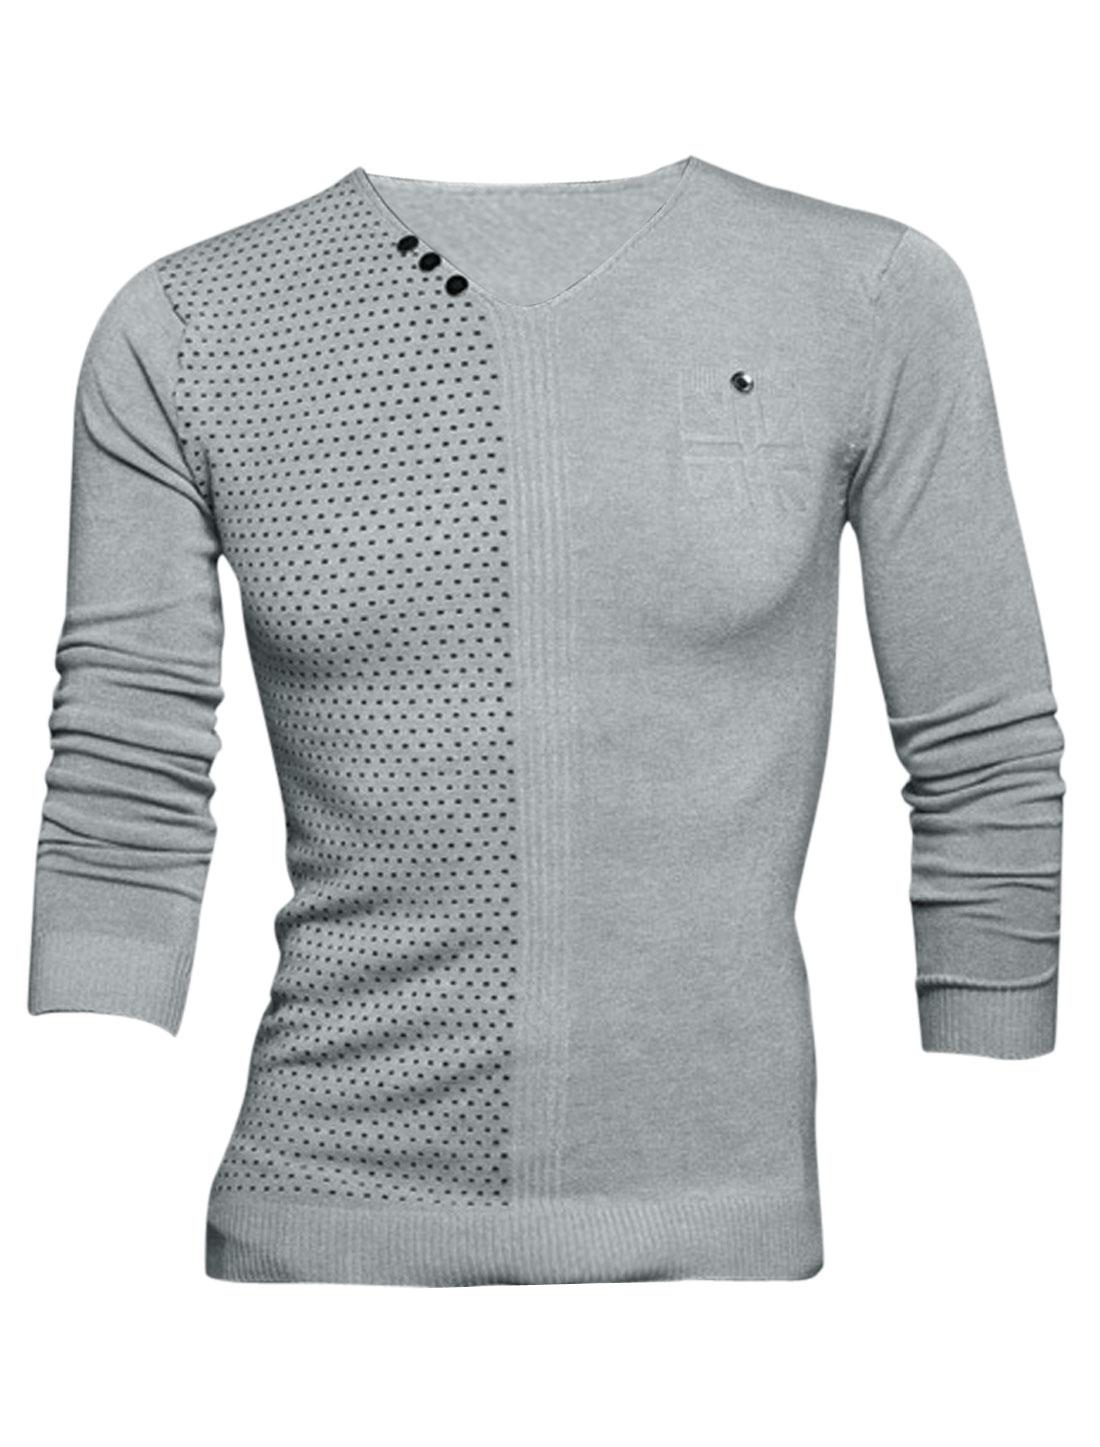 Men V Neck Novelty Prints Stitched Design Leisure Knit Shirt Gray M